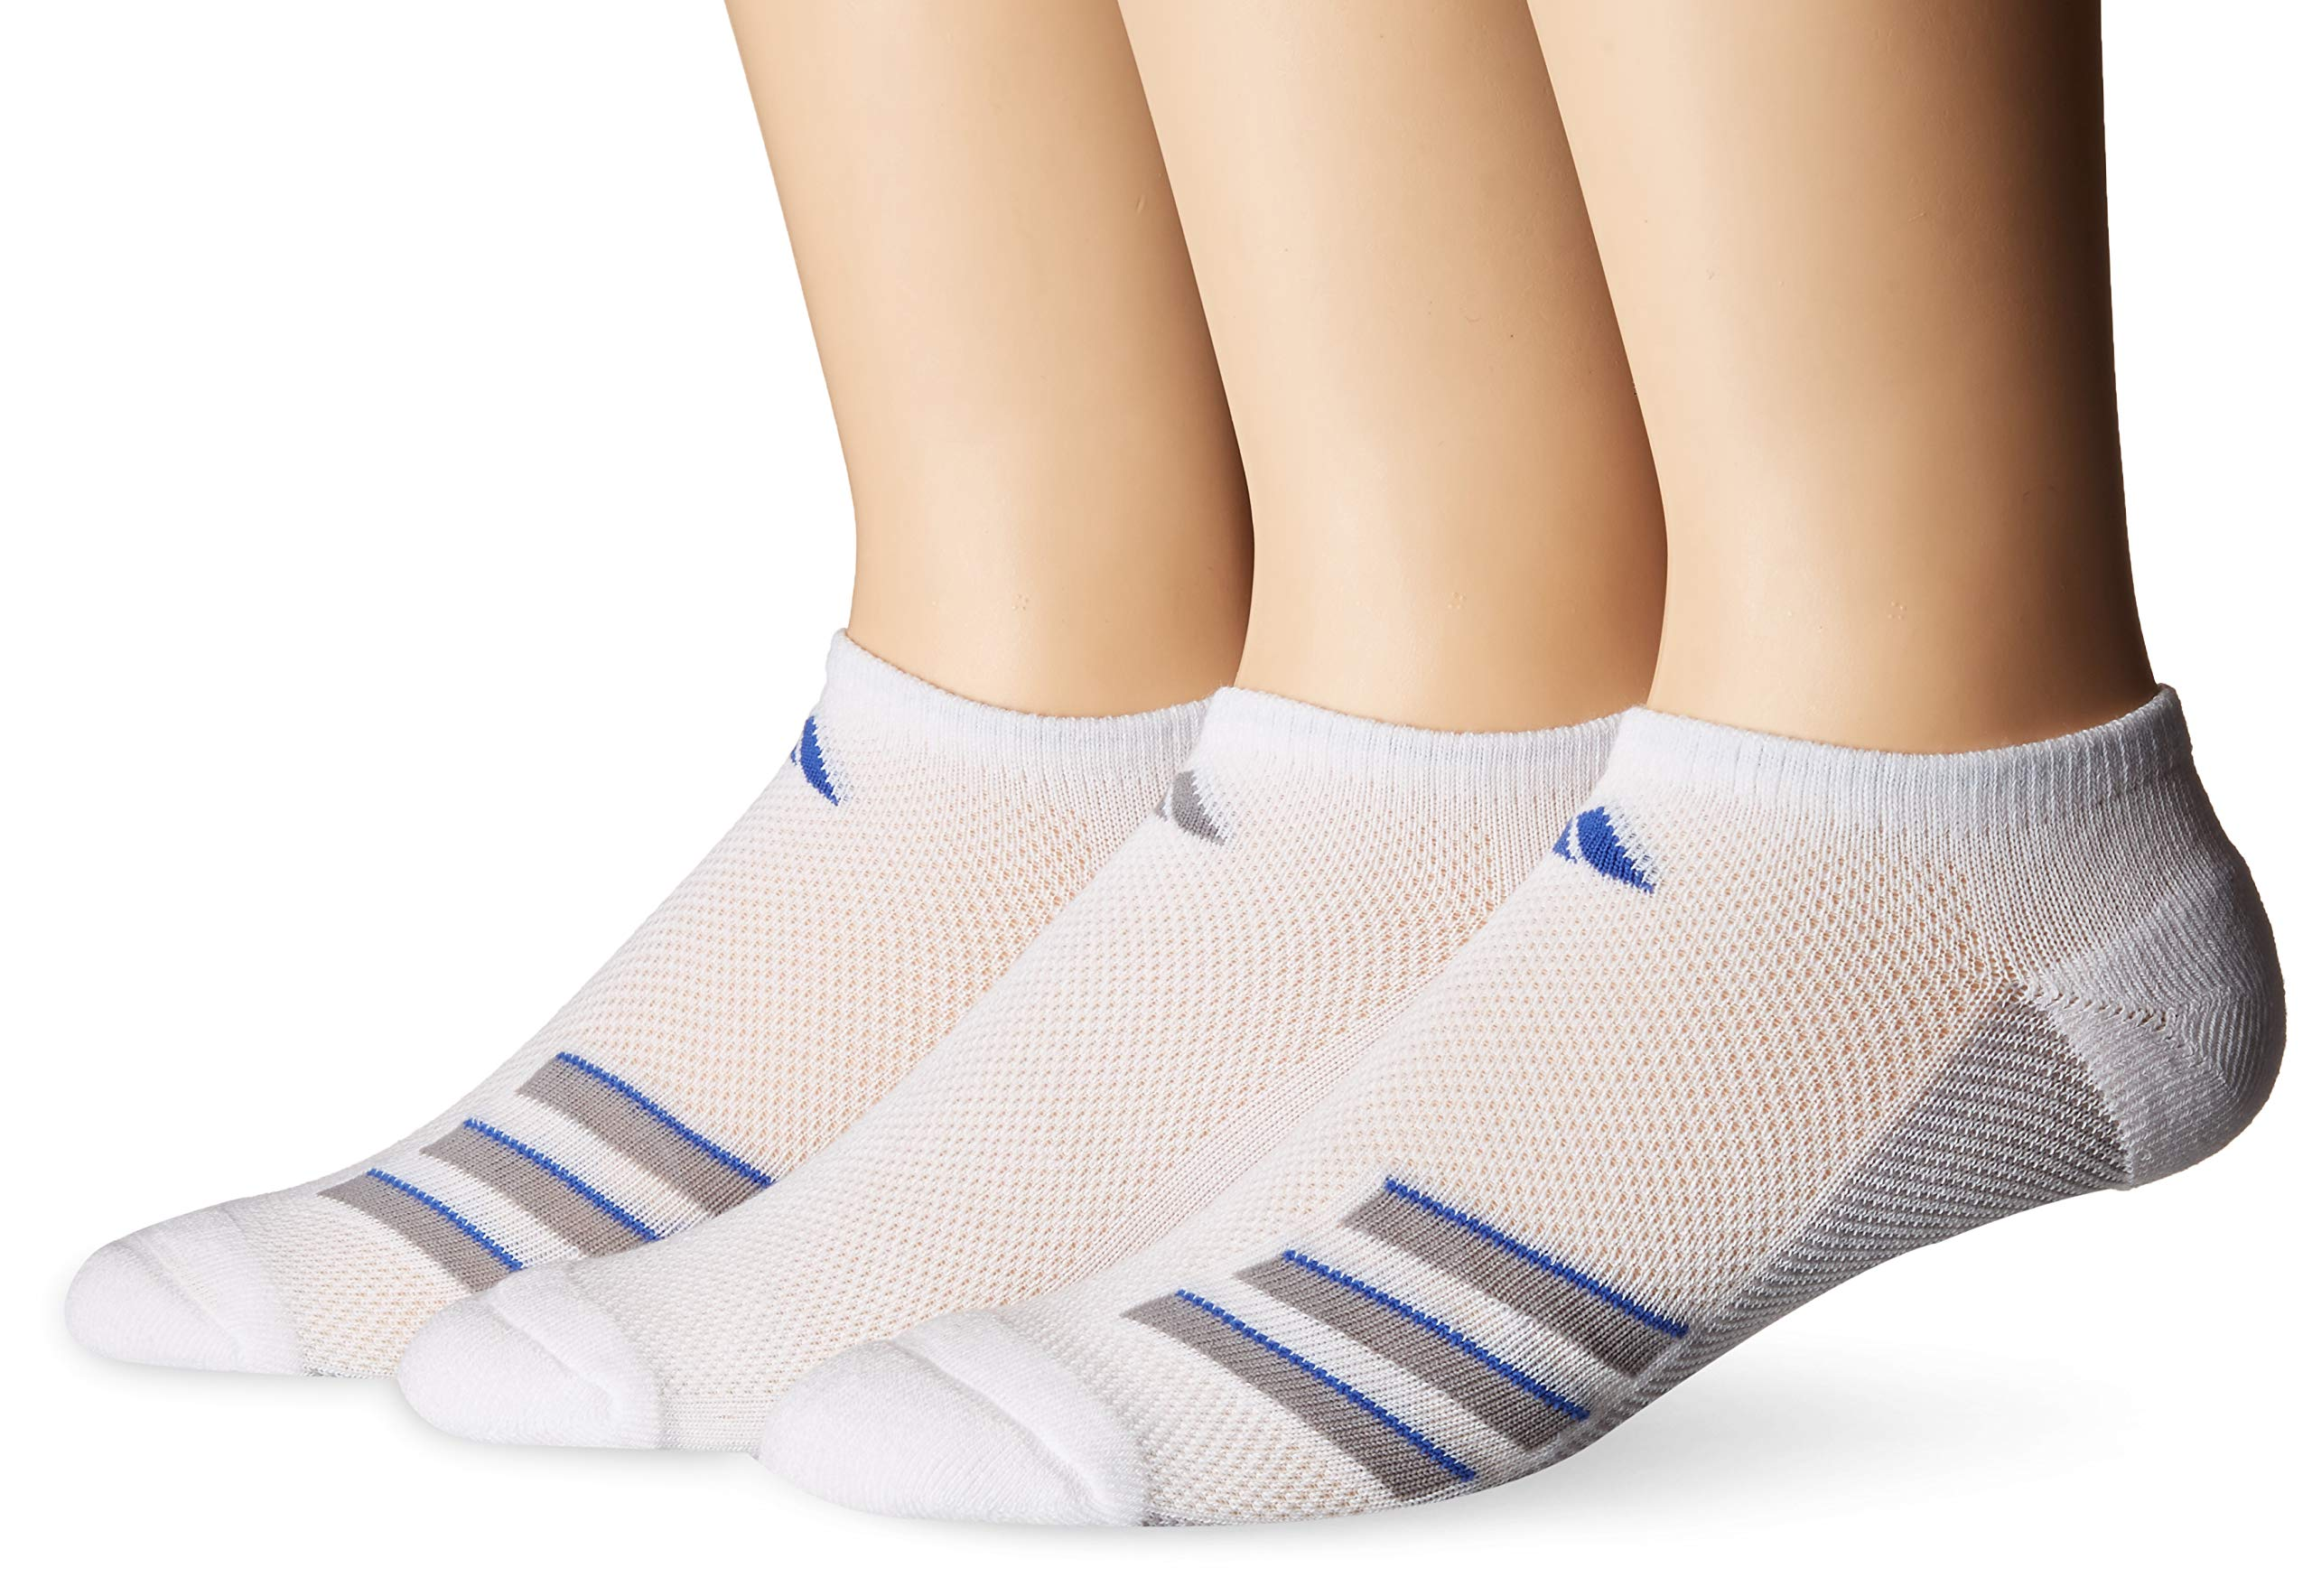 adidas Men's Climacool Superlite No Show Socks (3-Pack), White/Light Onix/Blue, Size 6-12